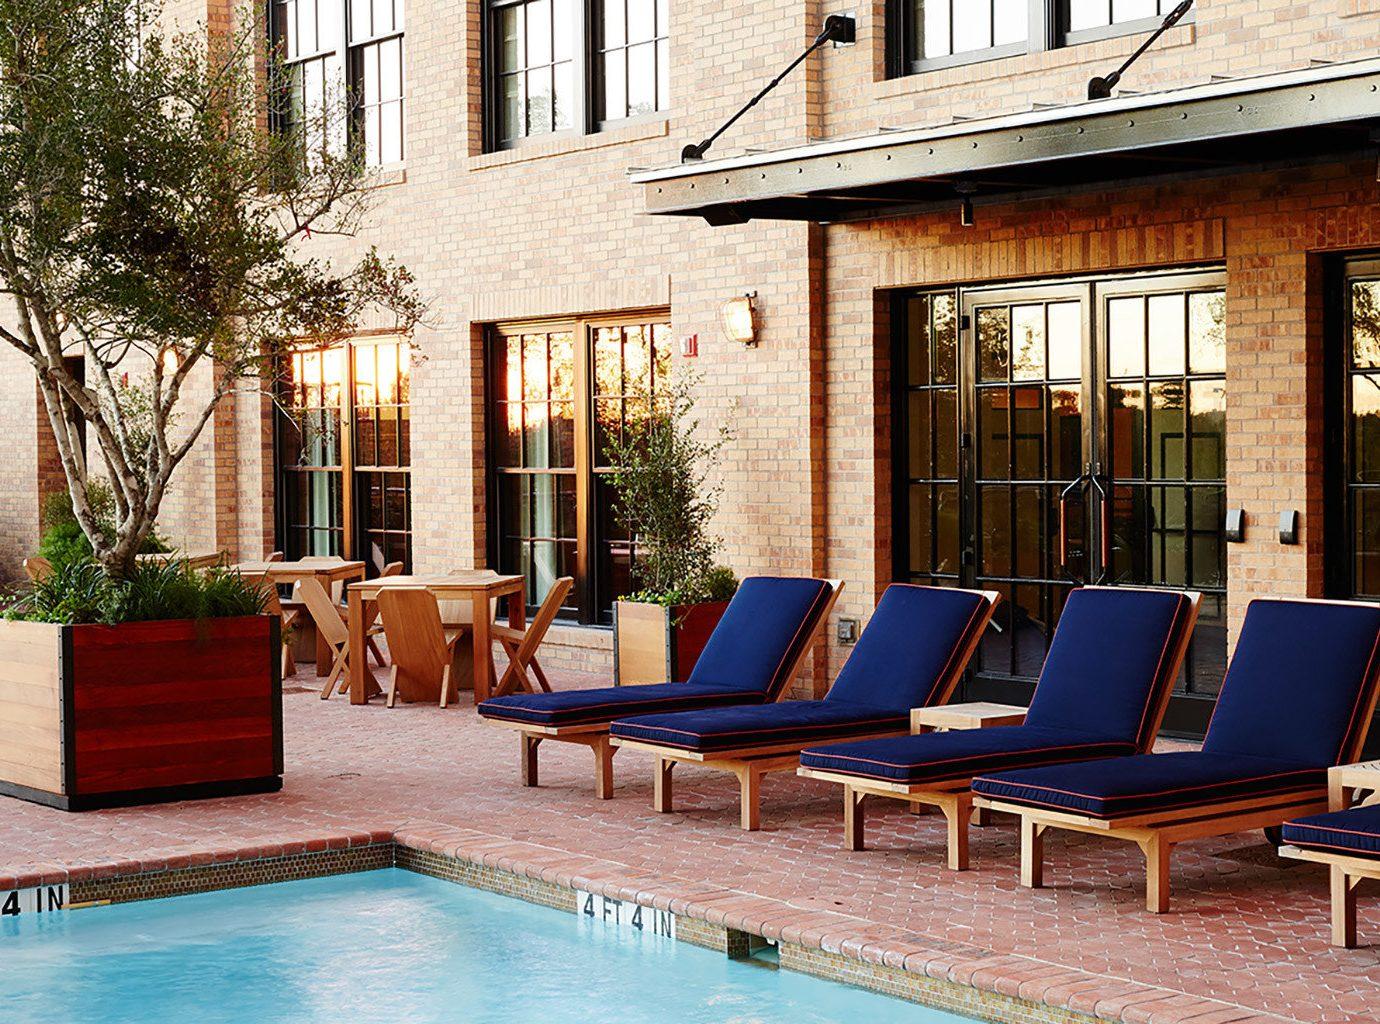 Pool at Hotel Emma in San Antonio